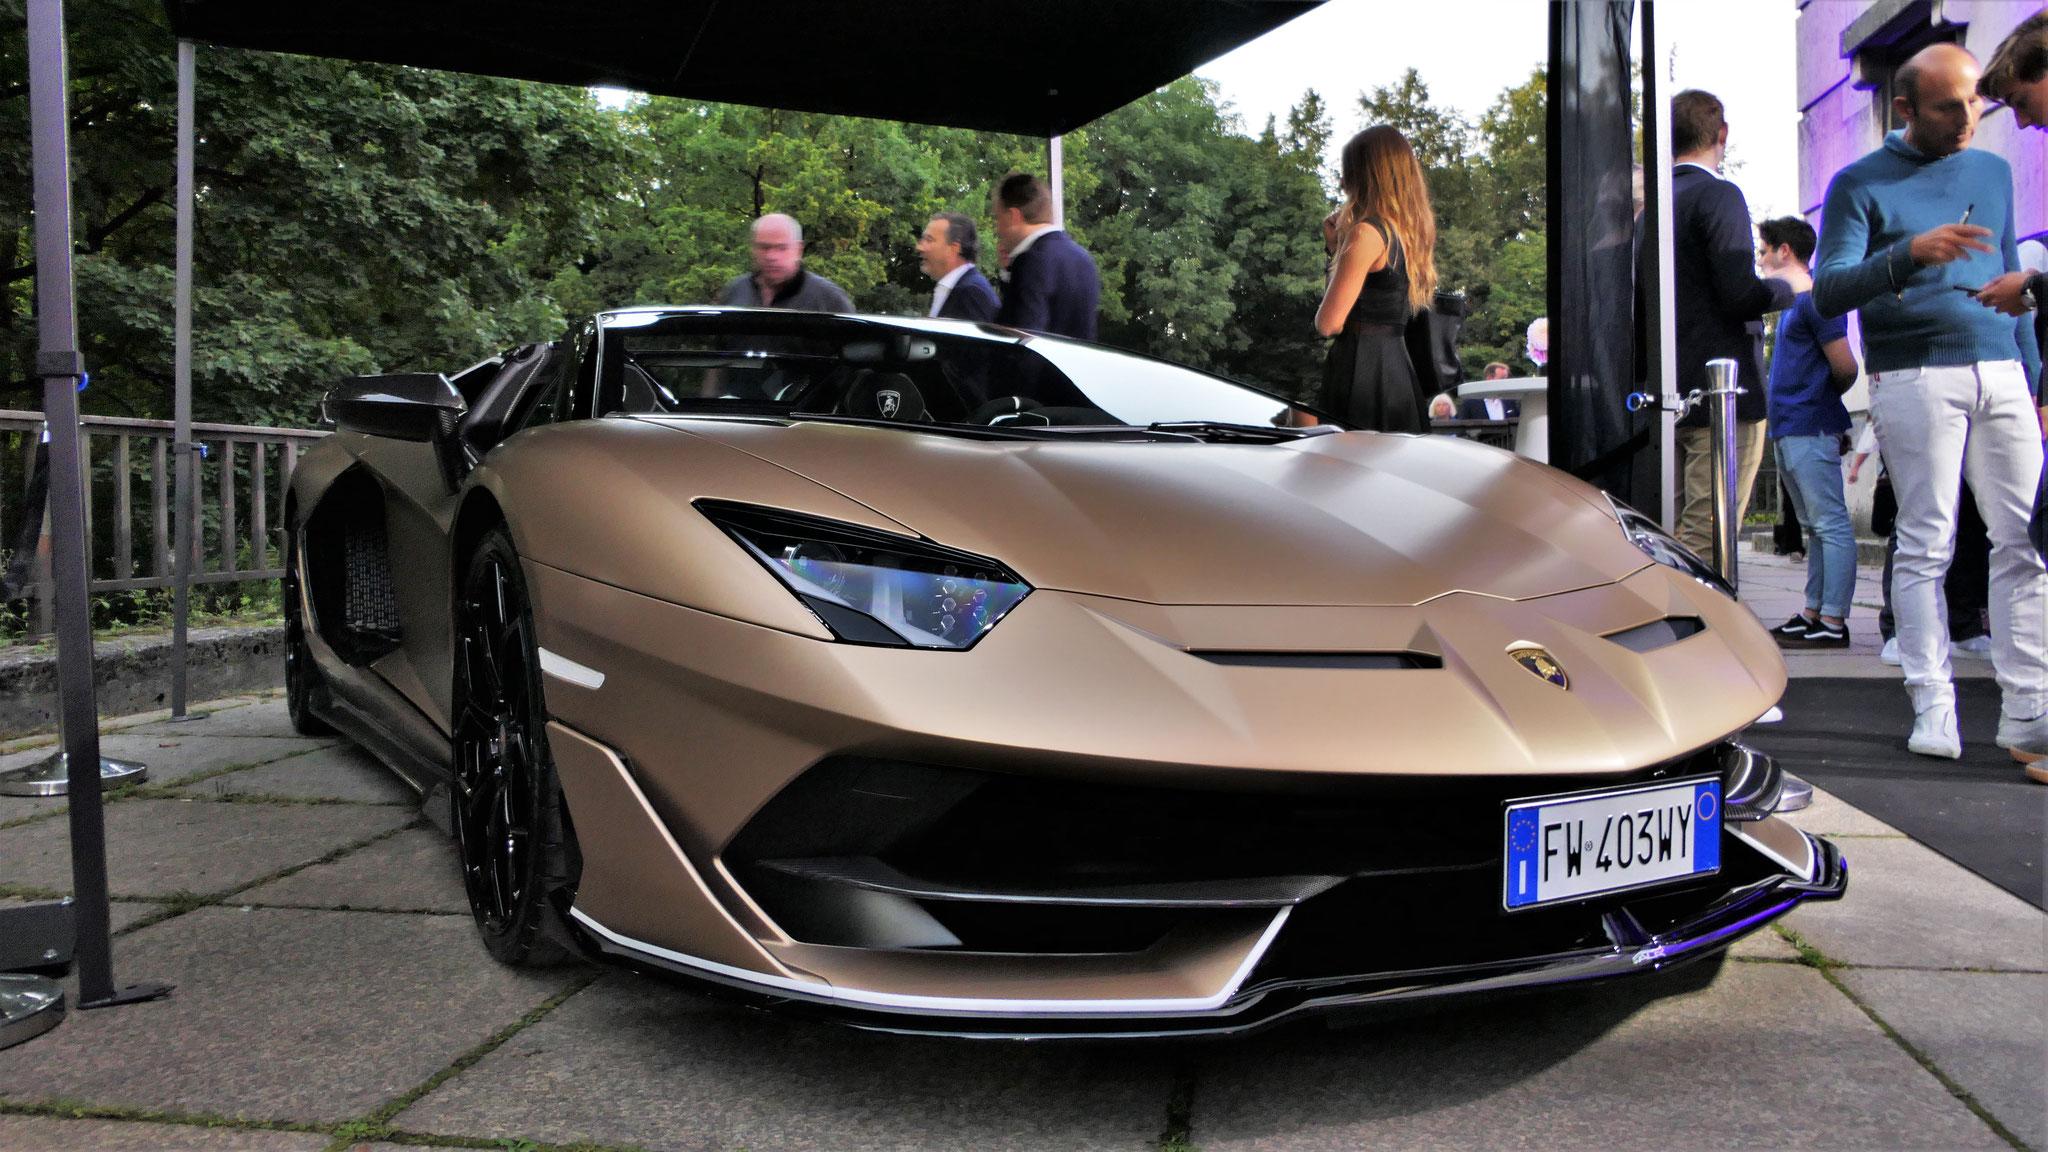 Lamborghini Aventador LP 770 SVJ Roadster - FW-403-WY (ITA)